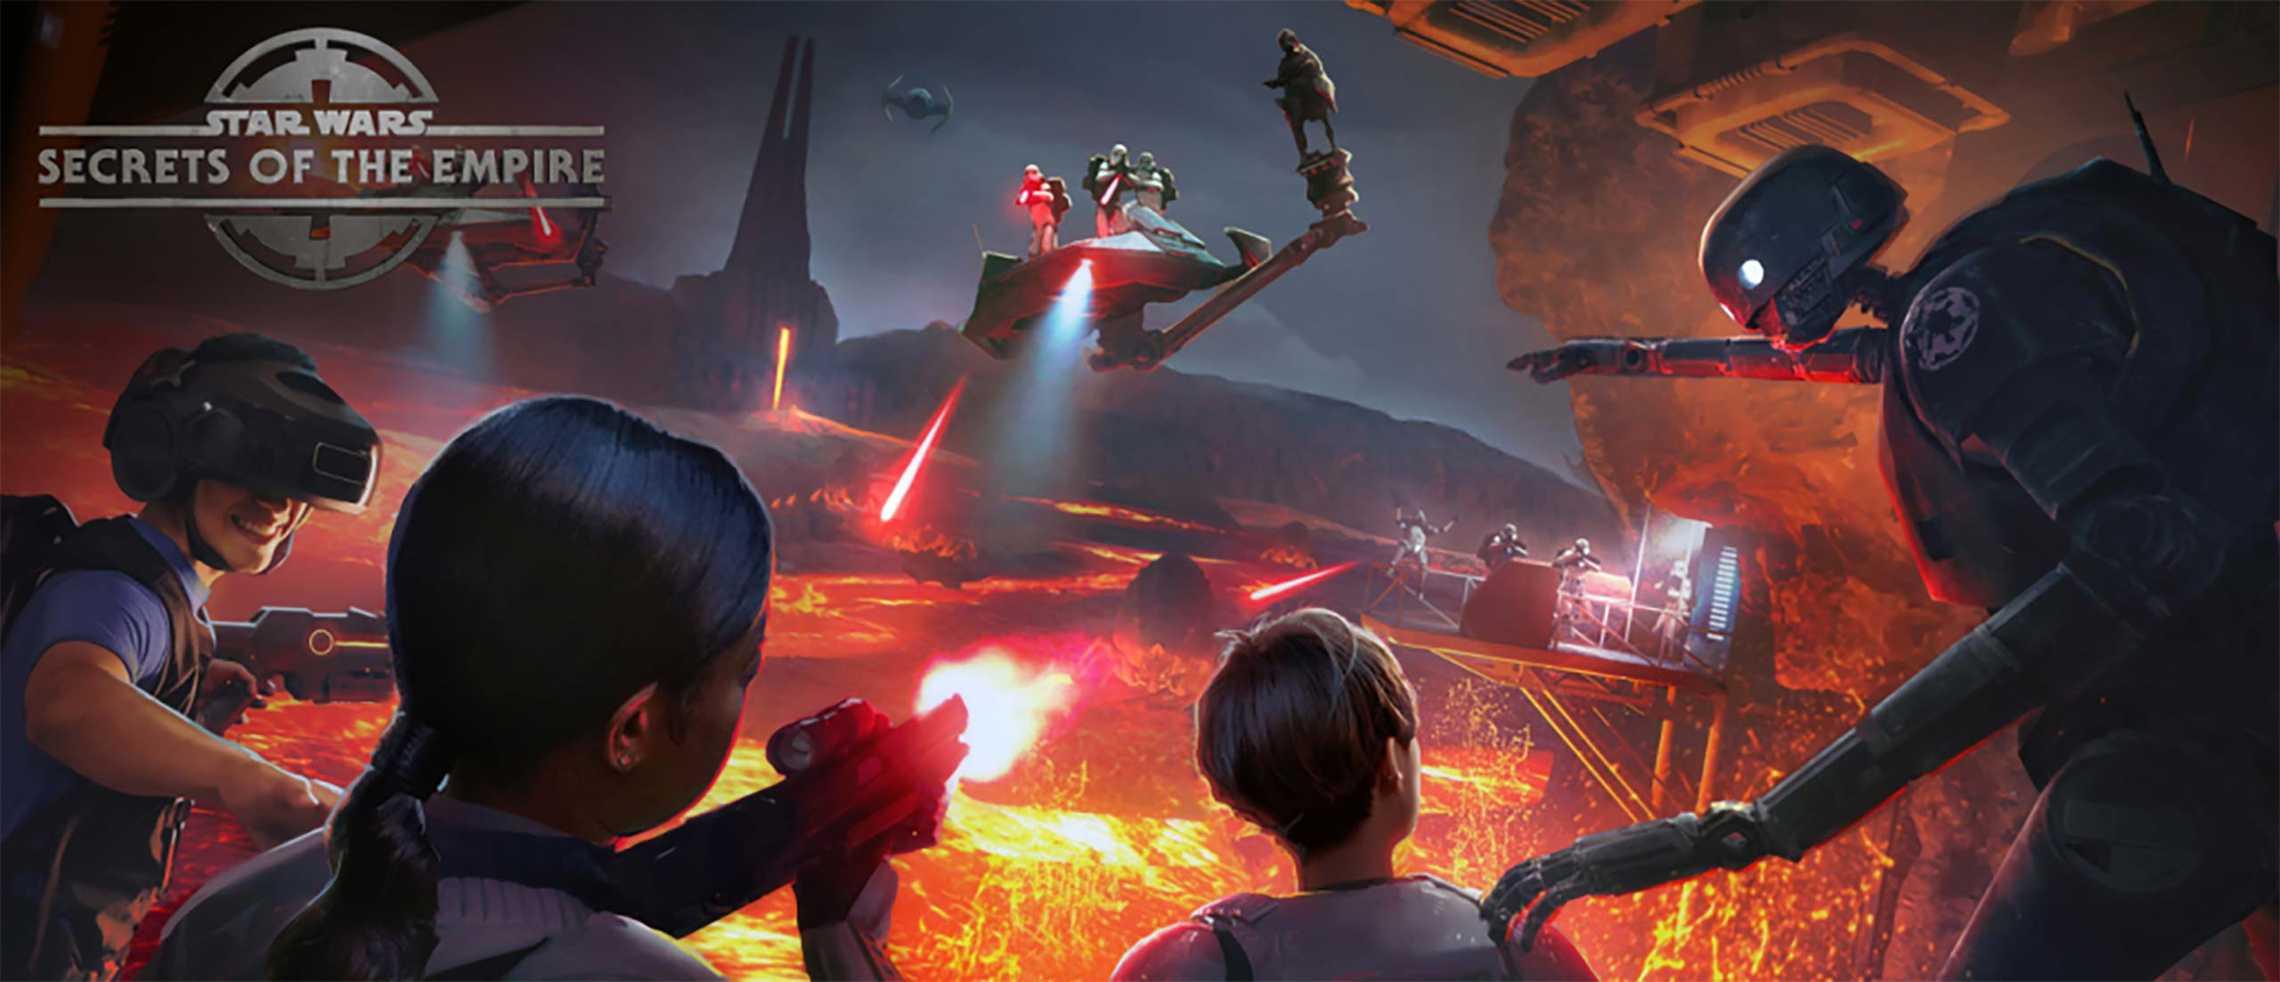 Star Wars - Secrets of the Empire